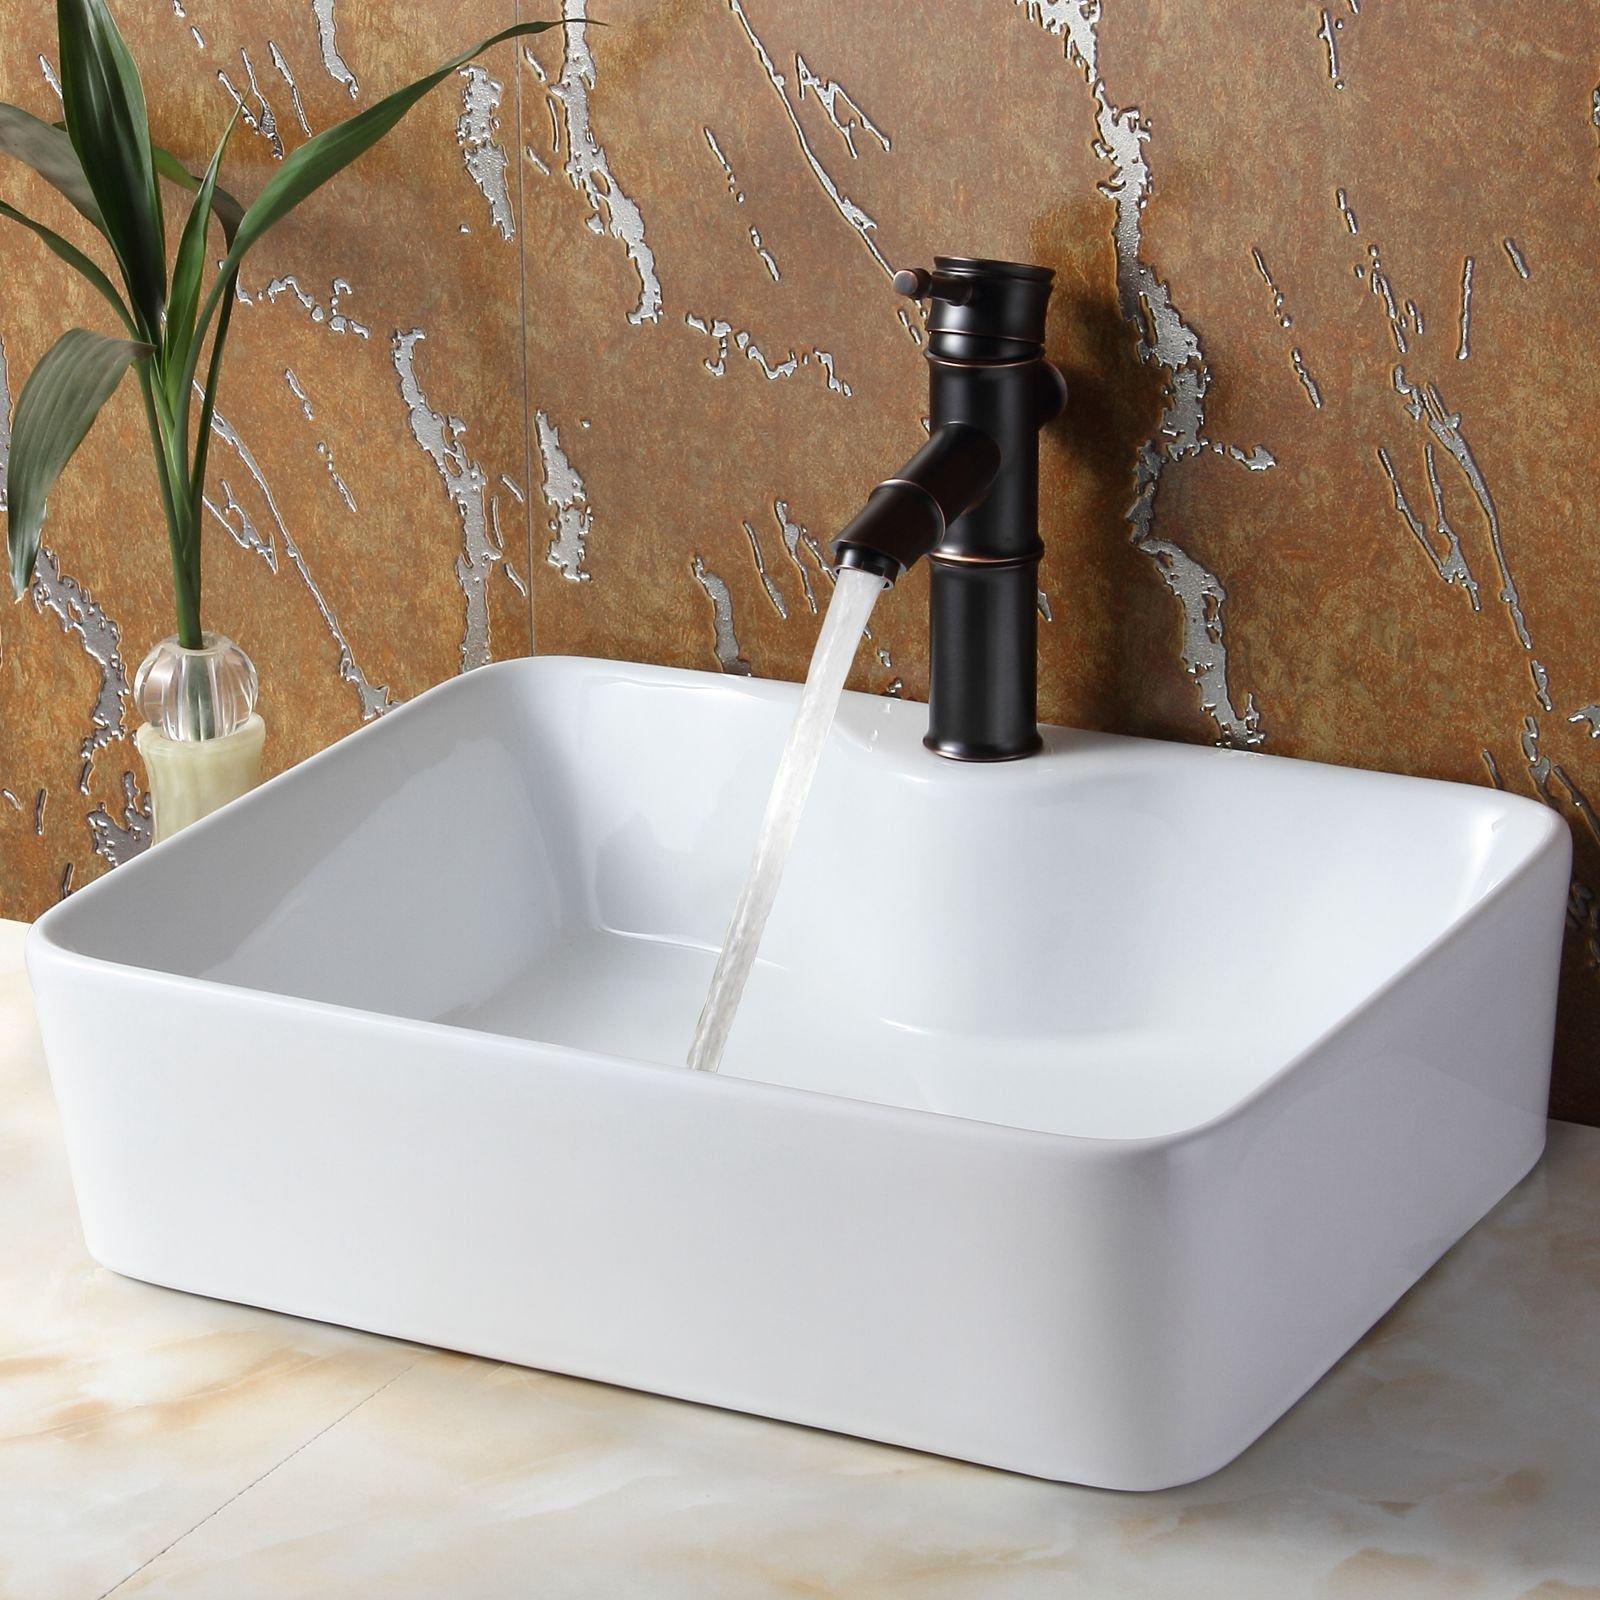 Bathroom Rectangle Porcelain Ceramic Vessel